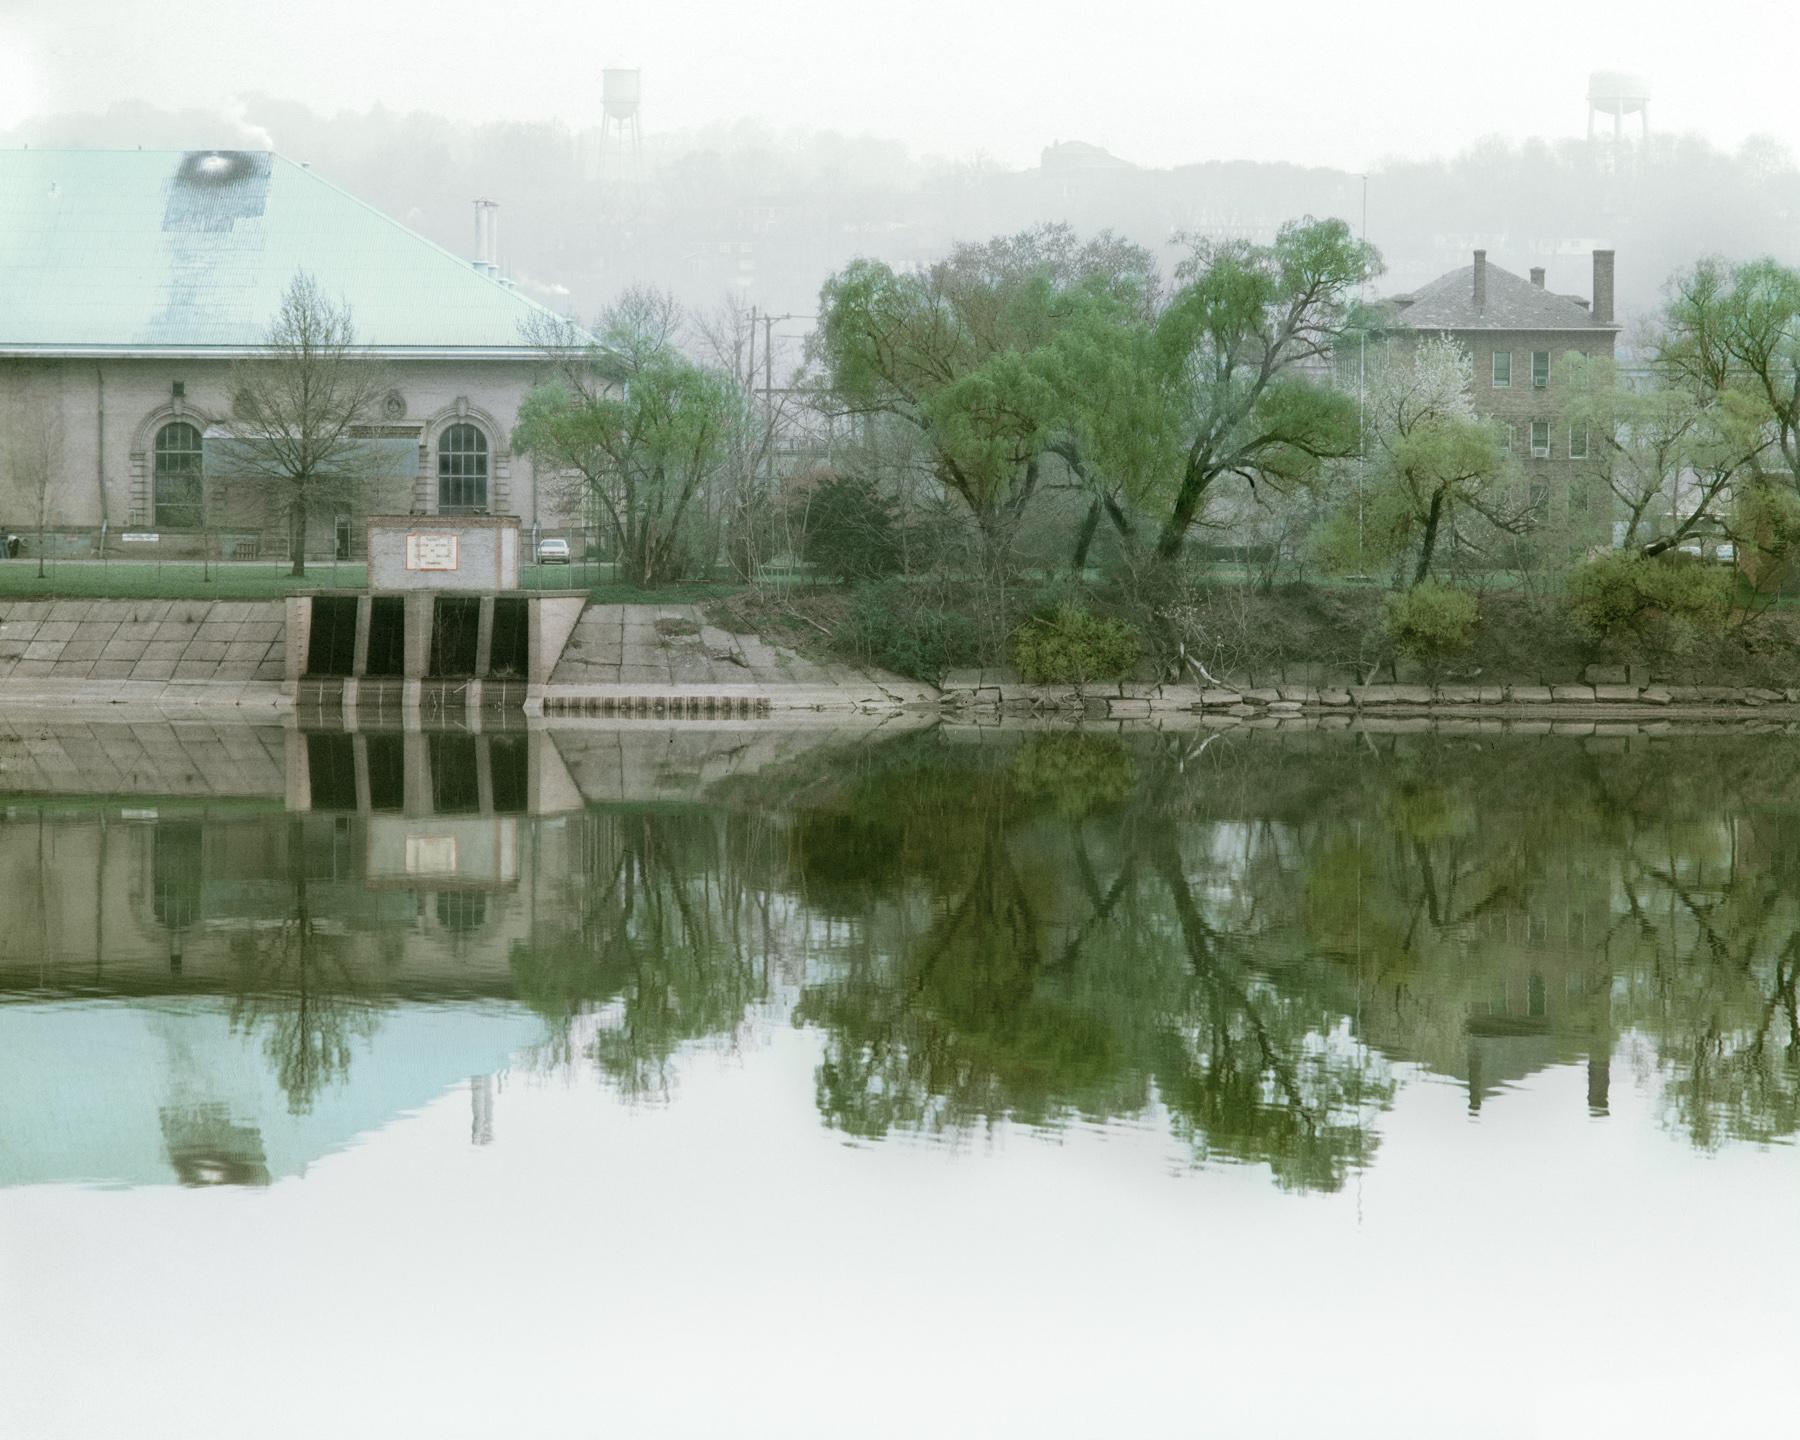 Pittsburgh Waterworks, Aspinwall, Pennsylvania, 1976